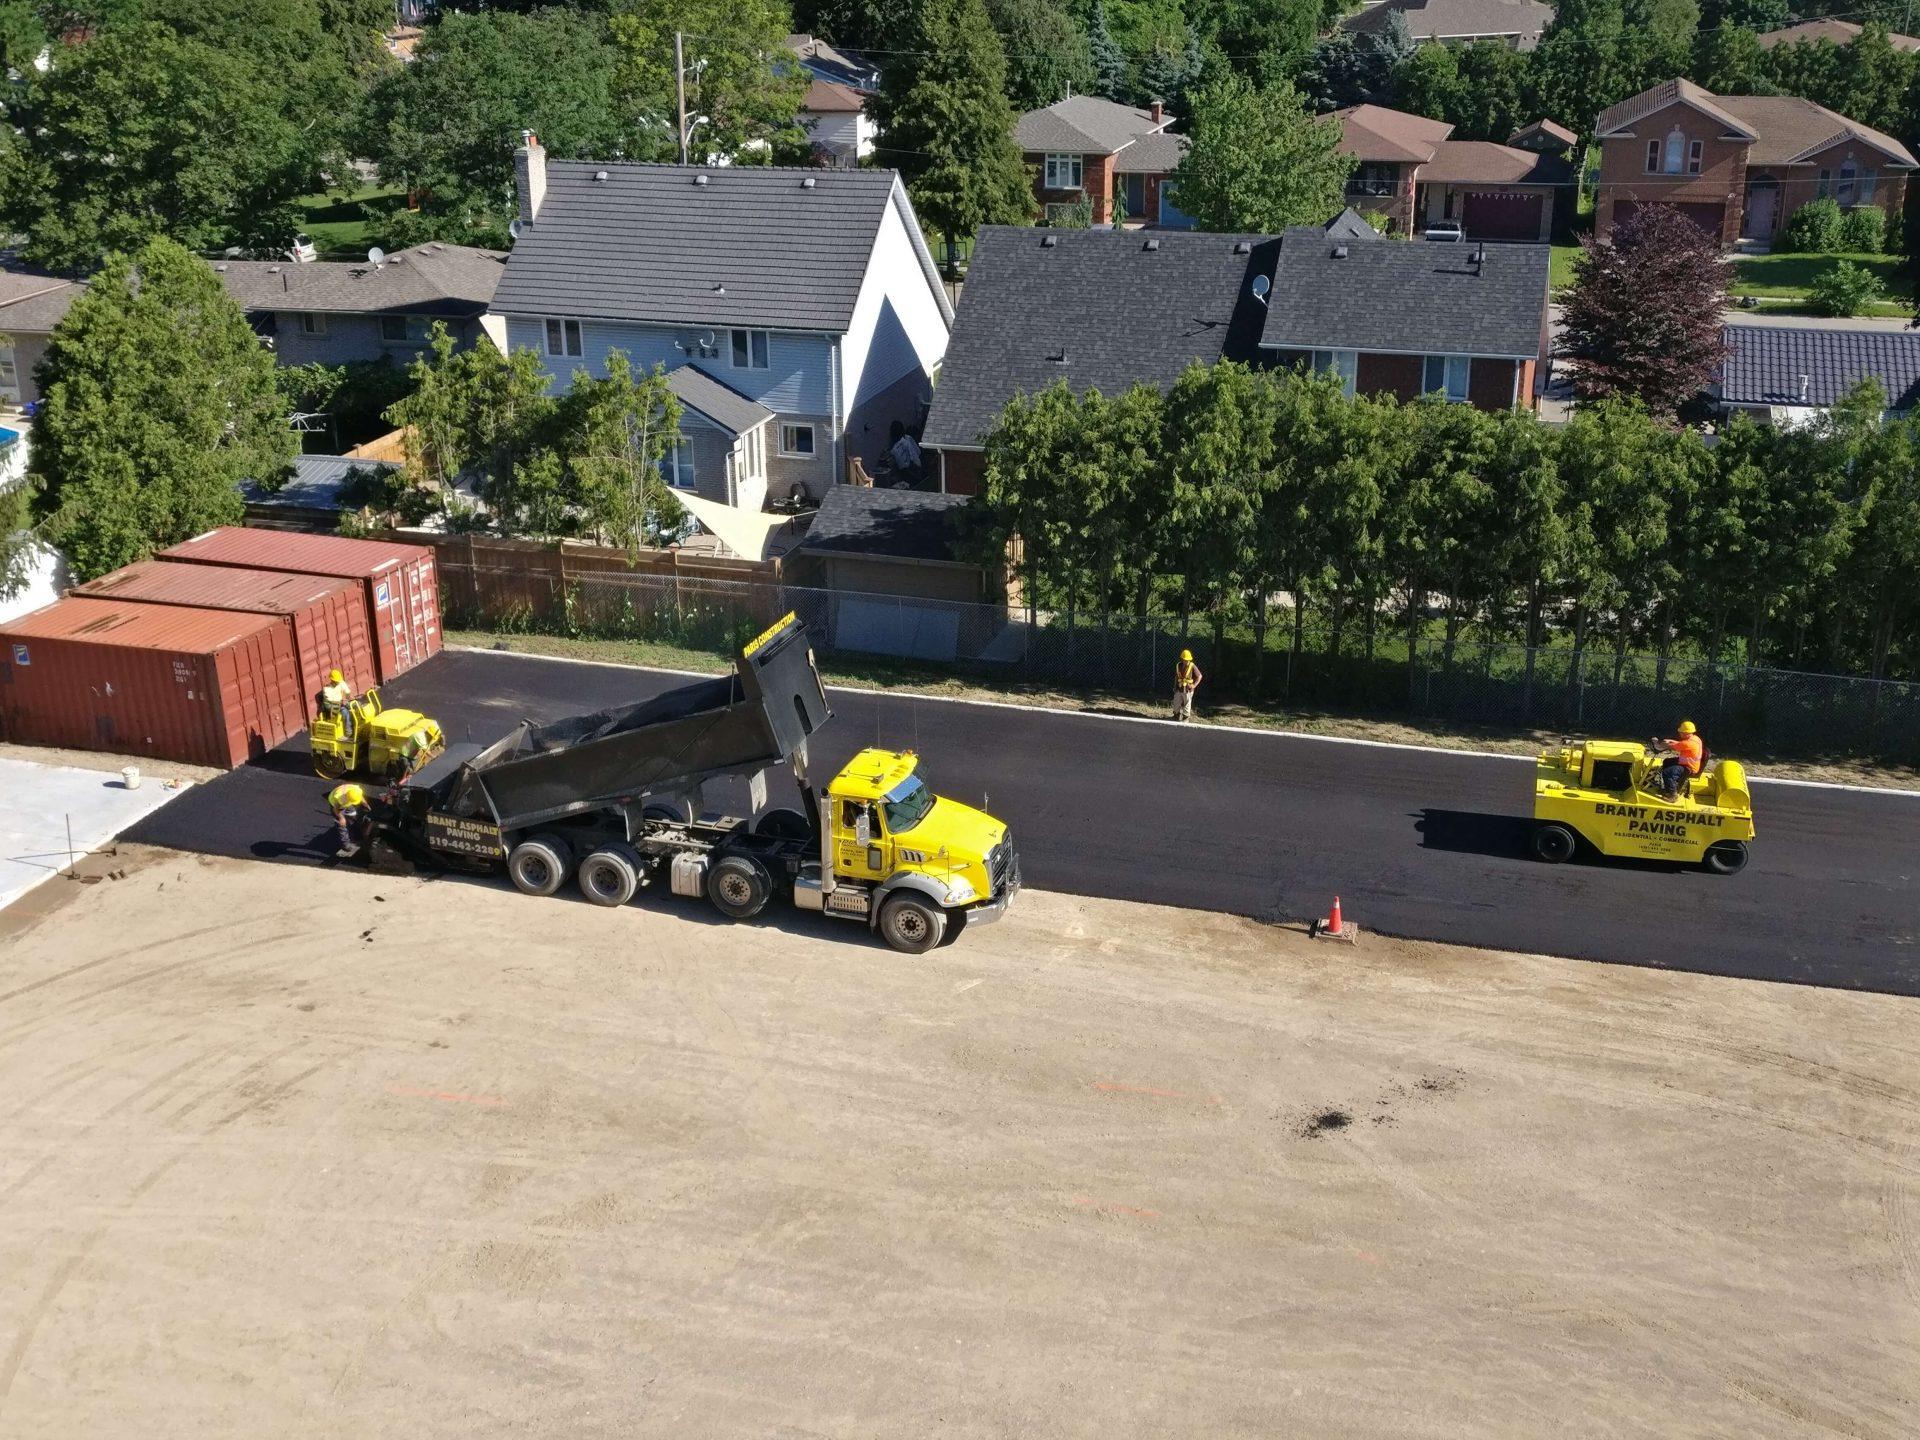 Paris Construction starting paving work